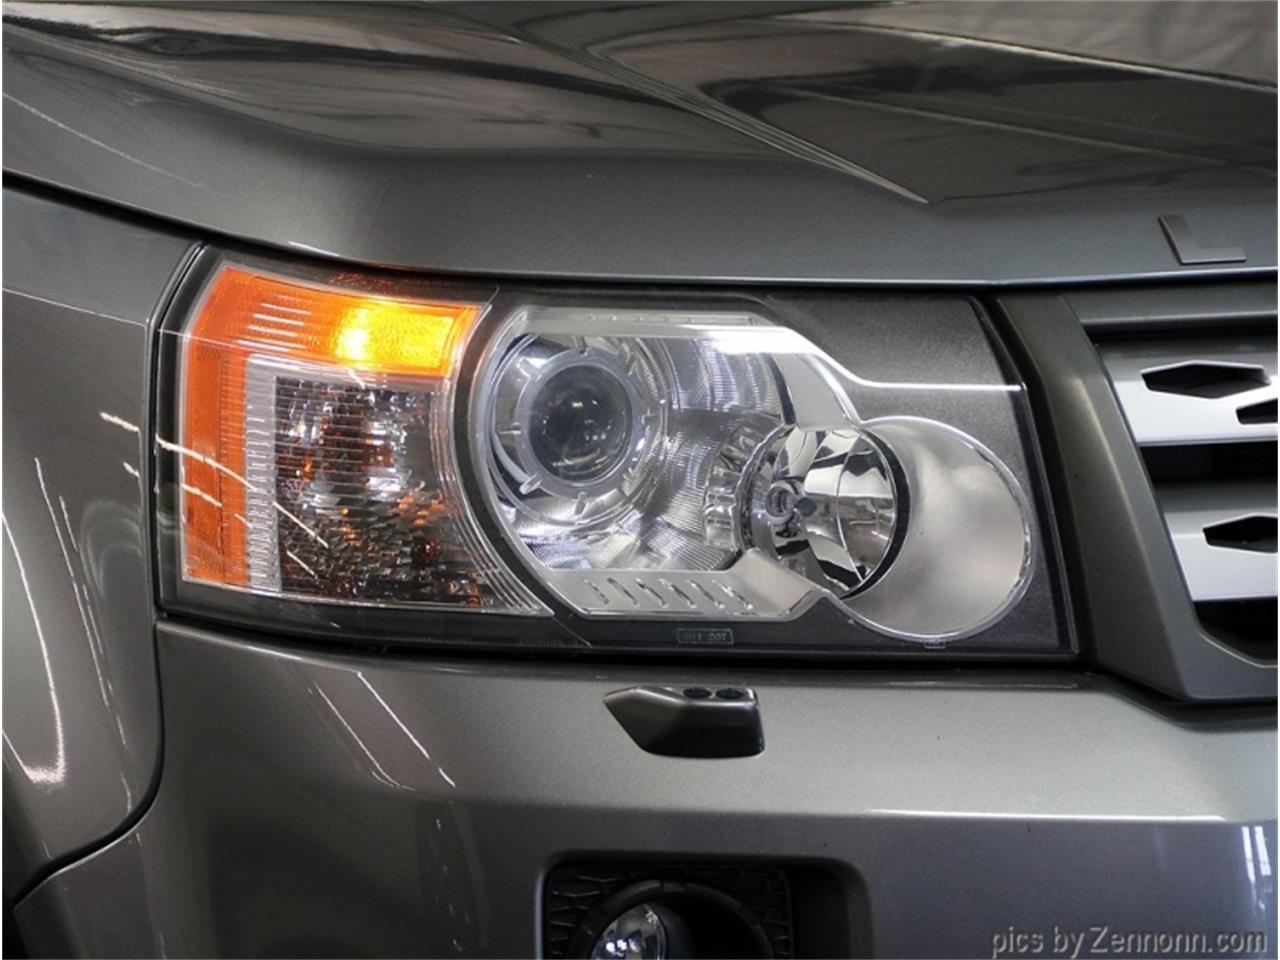 2012 Land Rover LR2 (CC-1379546) for sale in Addison, Illinois